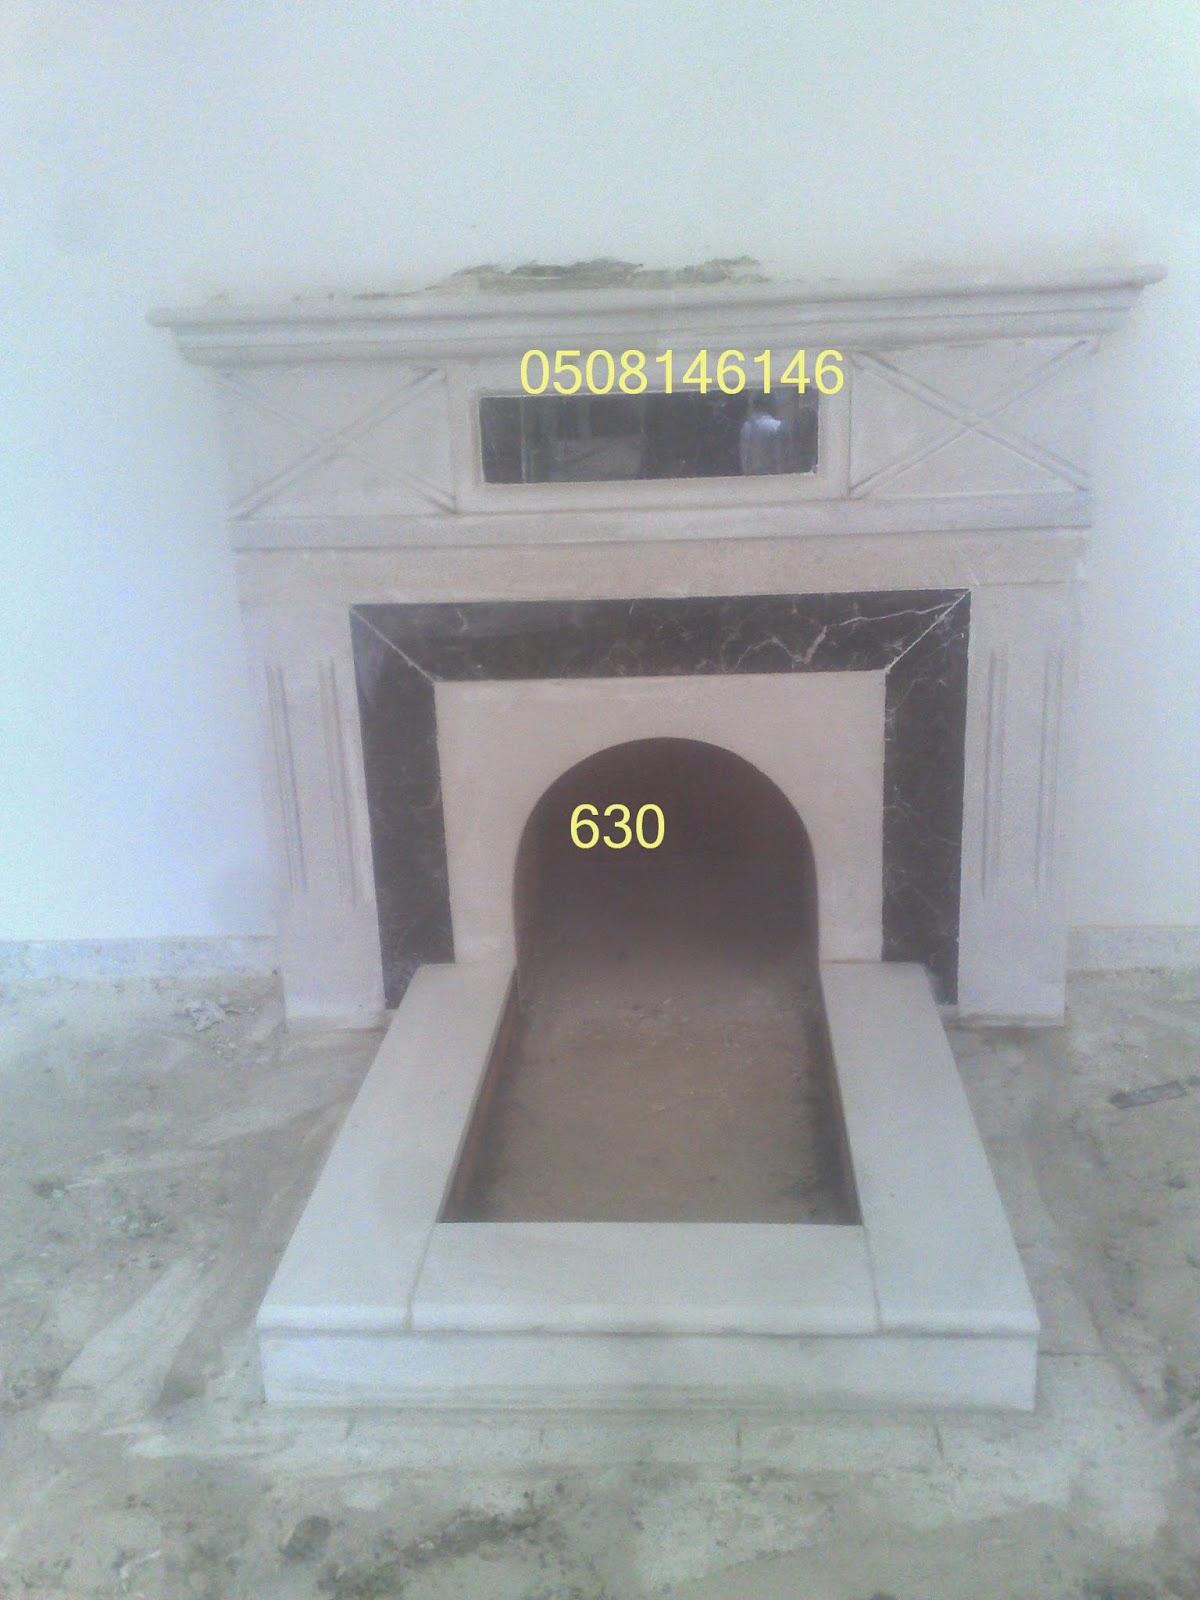 ديكورات مشبات 630.jpg